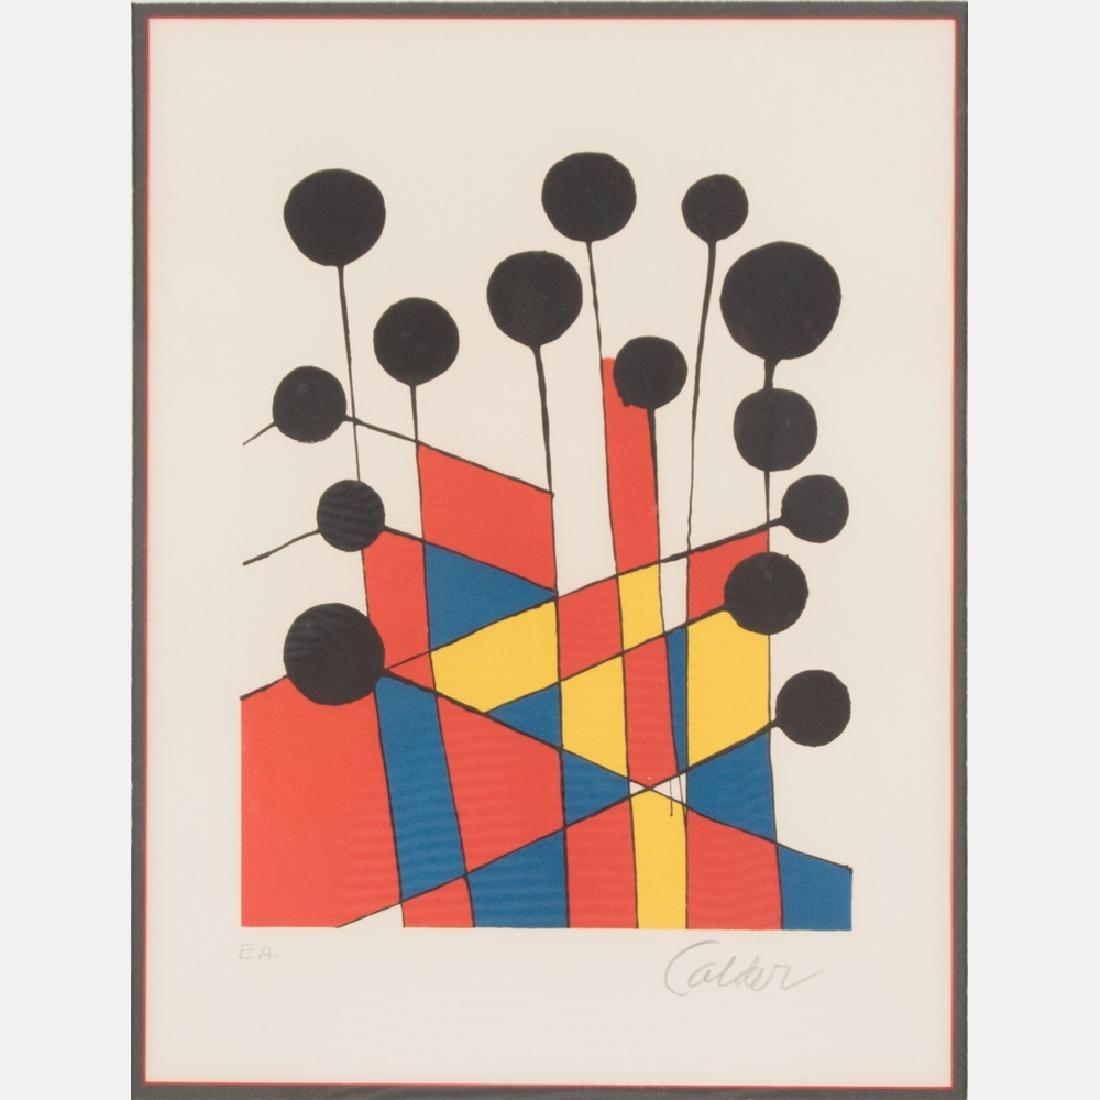 Alexander Calder (1898-1976) Balloons, 1971,